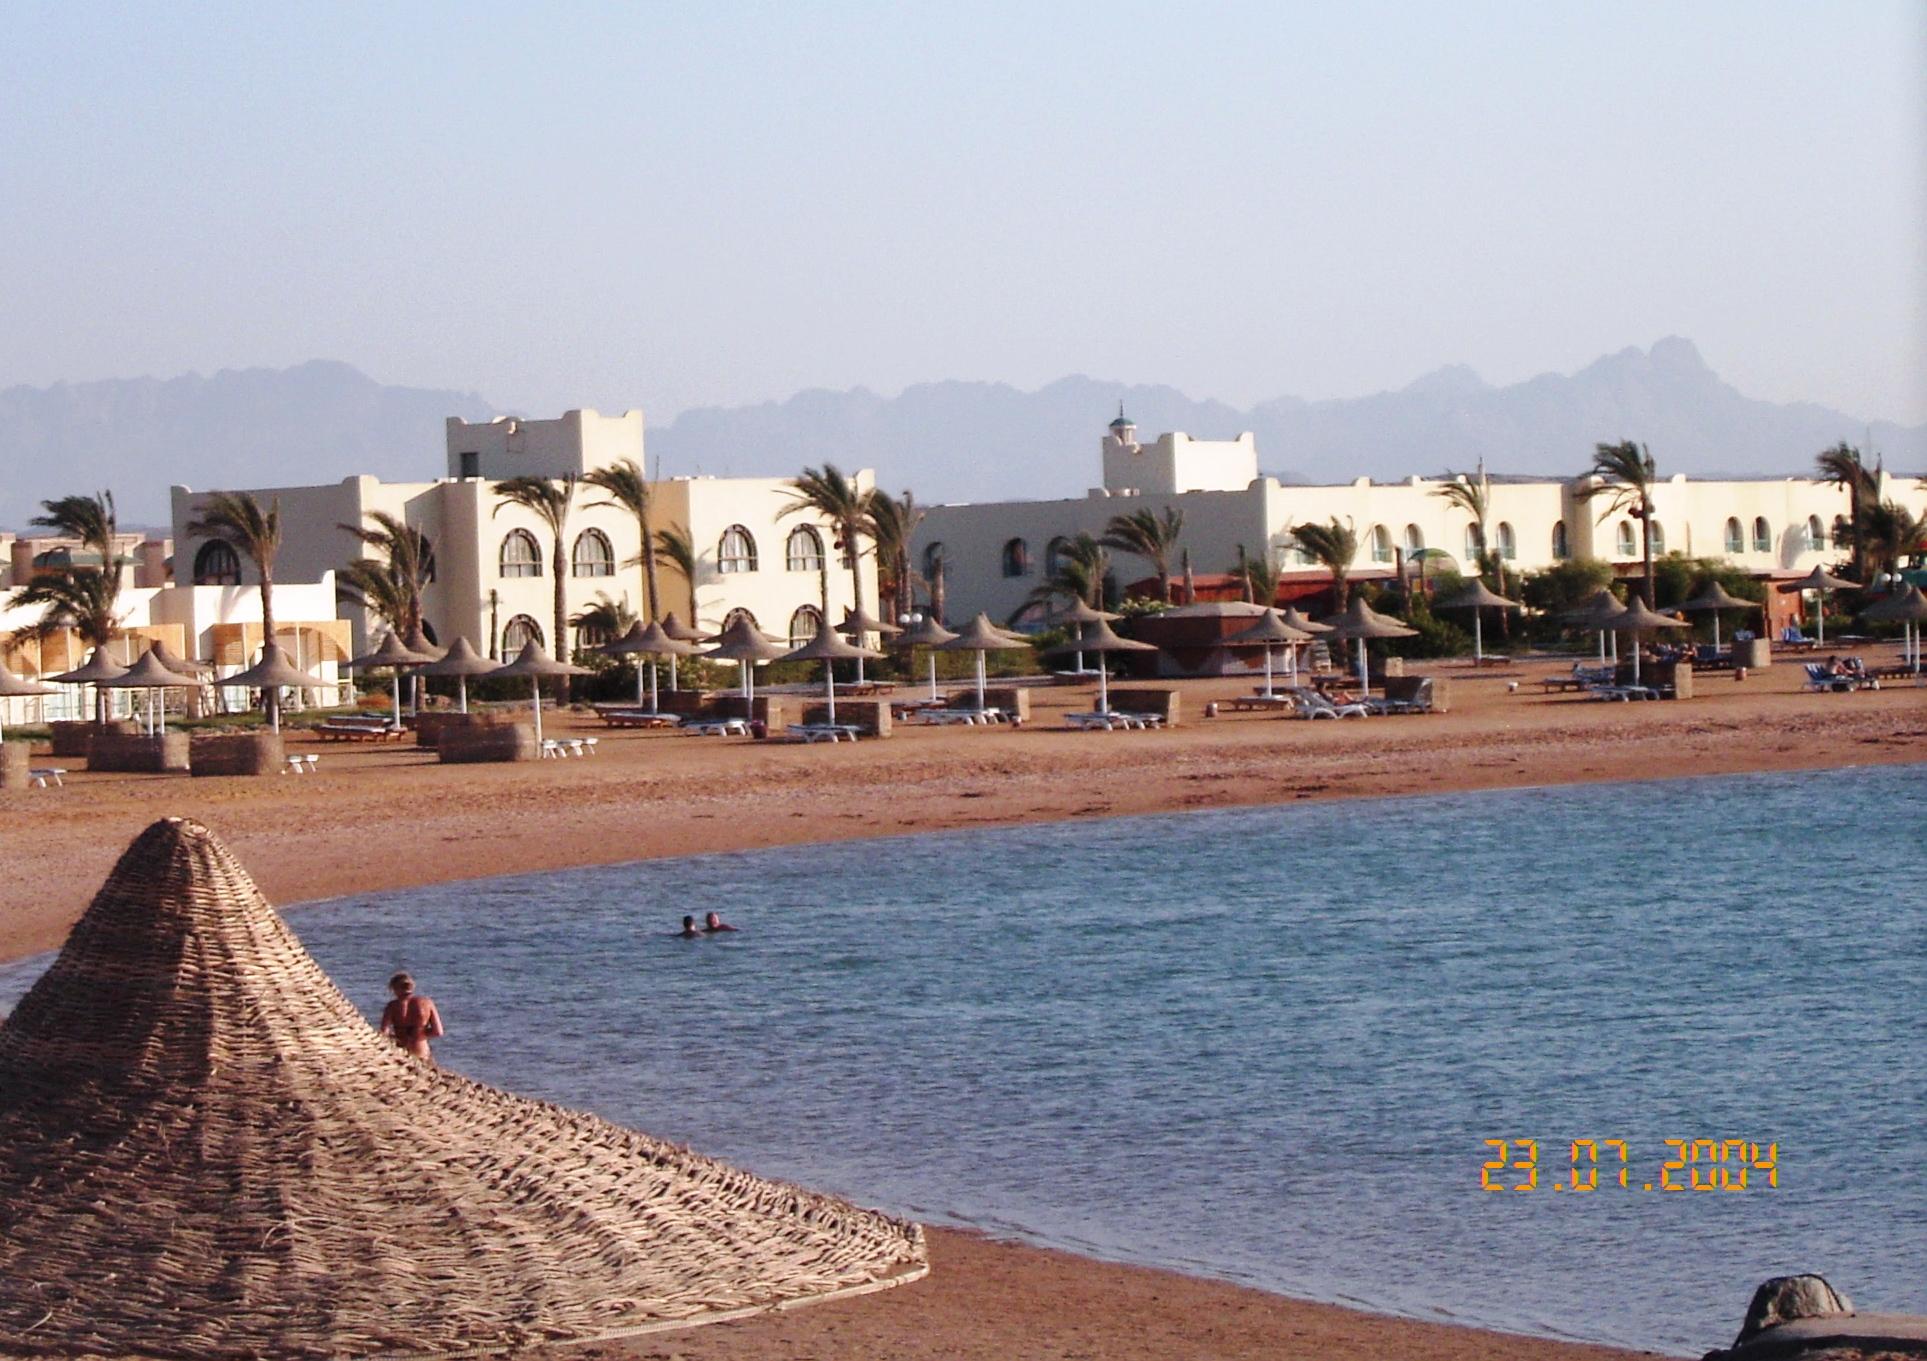 Baia spiaggia Hurgada, Egitto